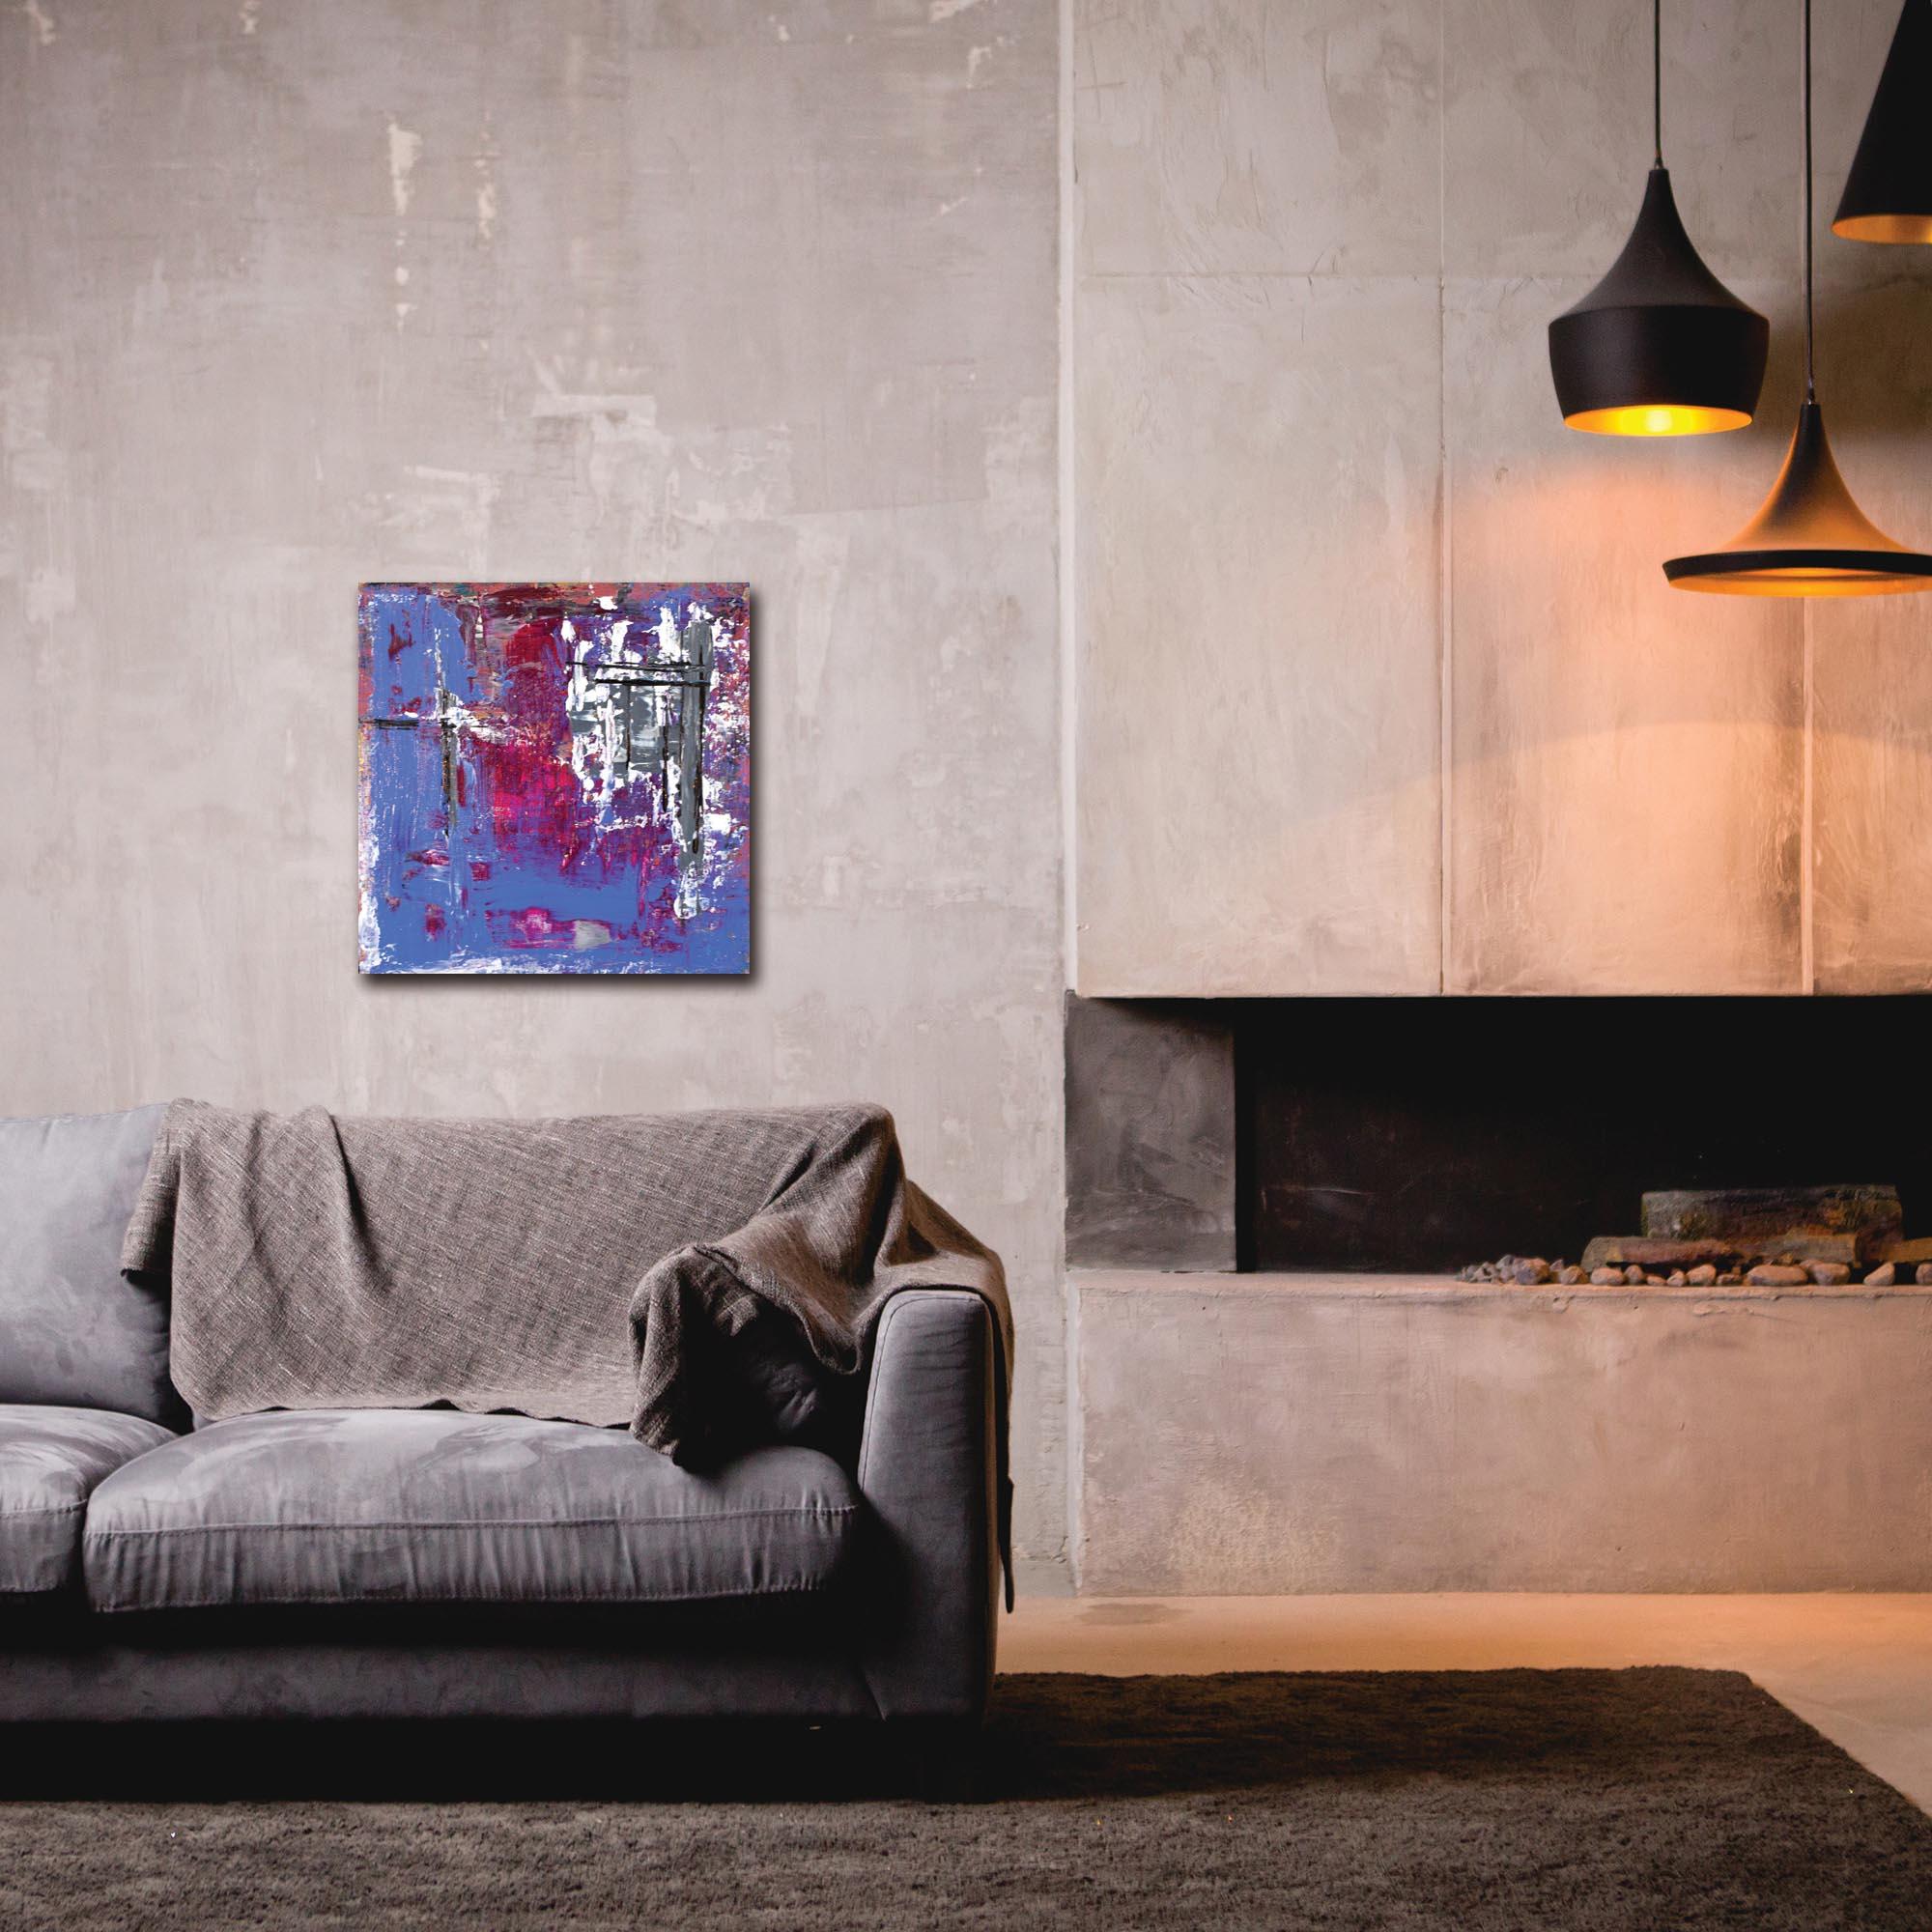 Abstract Wall Art 'Urban Life 7' - Urban Decor on Metal or Plexiglass - Lifestyle View